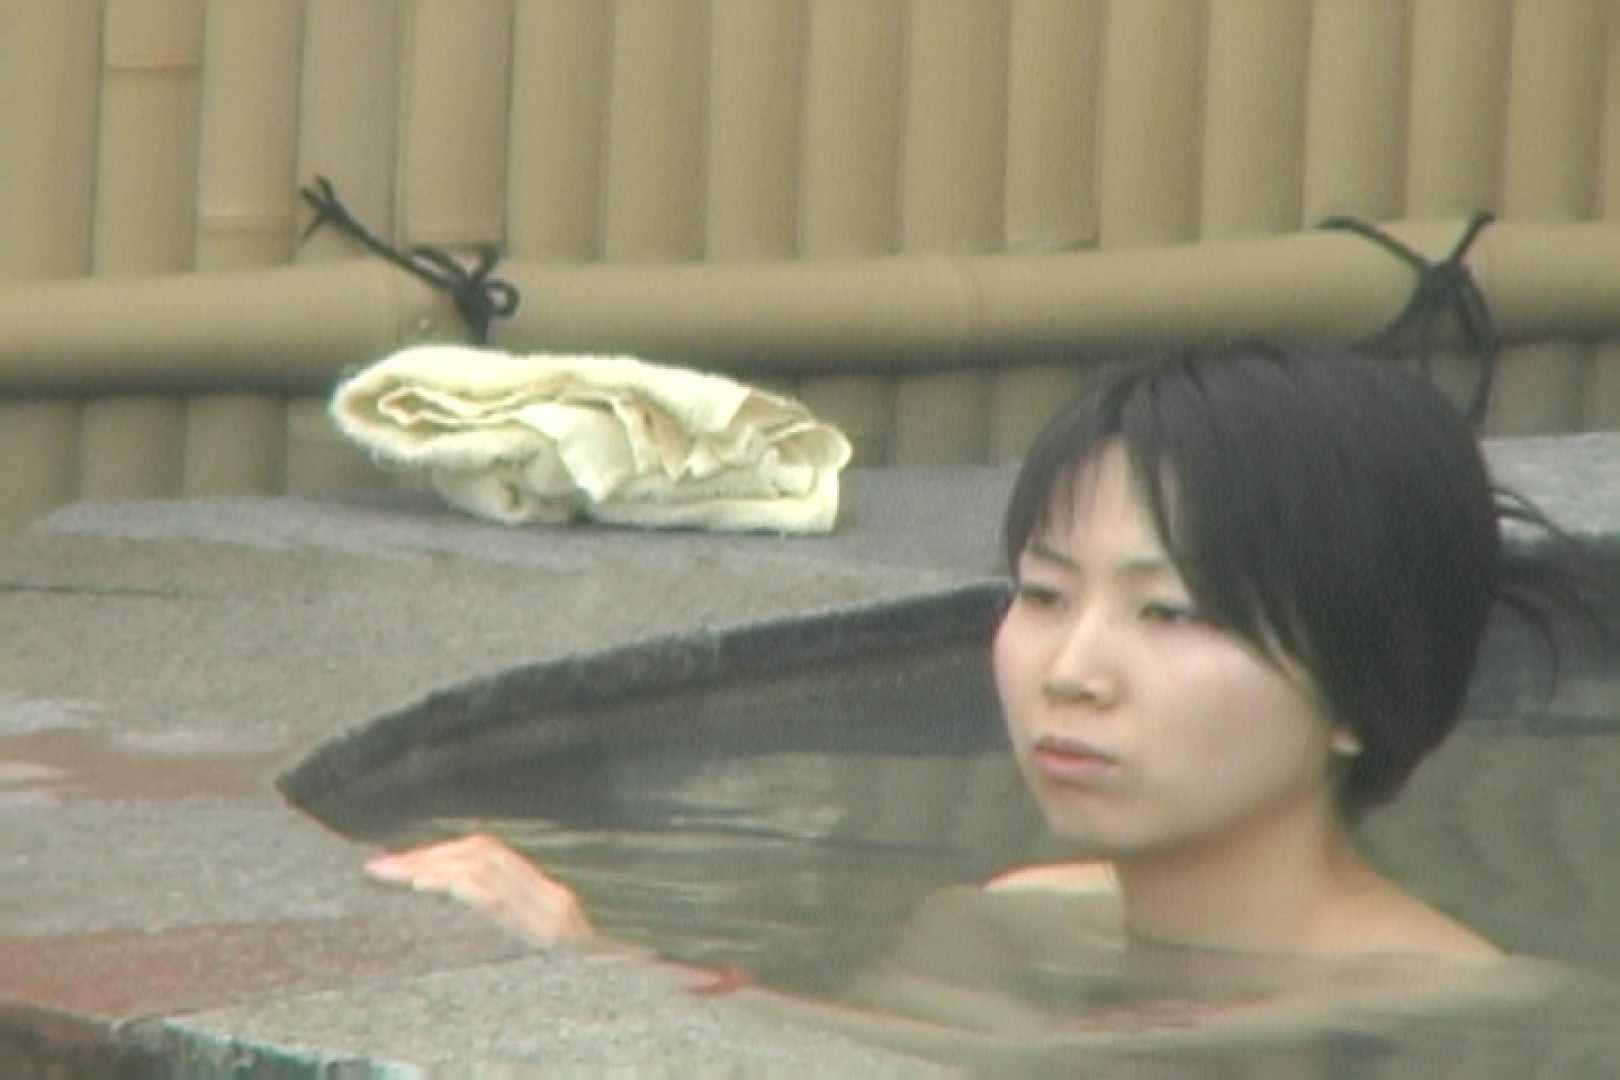 Aquaな露天風呂Vol.567 0 | 0  105連発 49